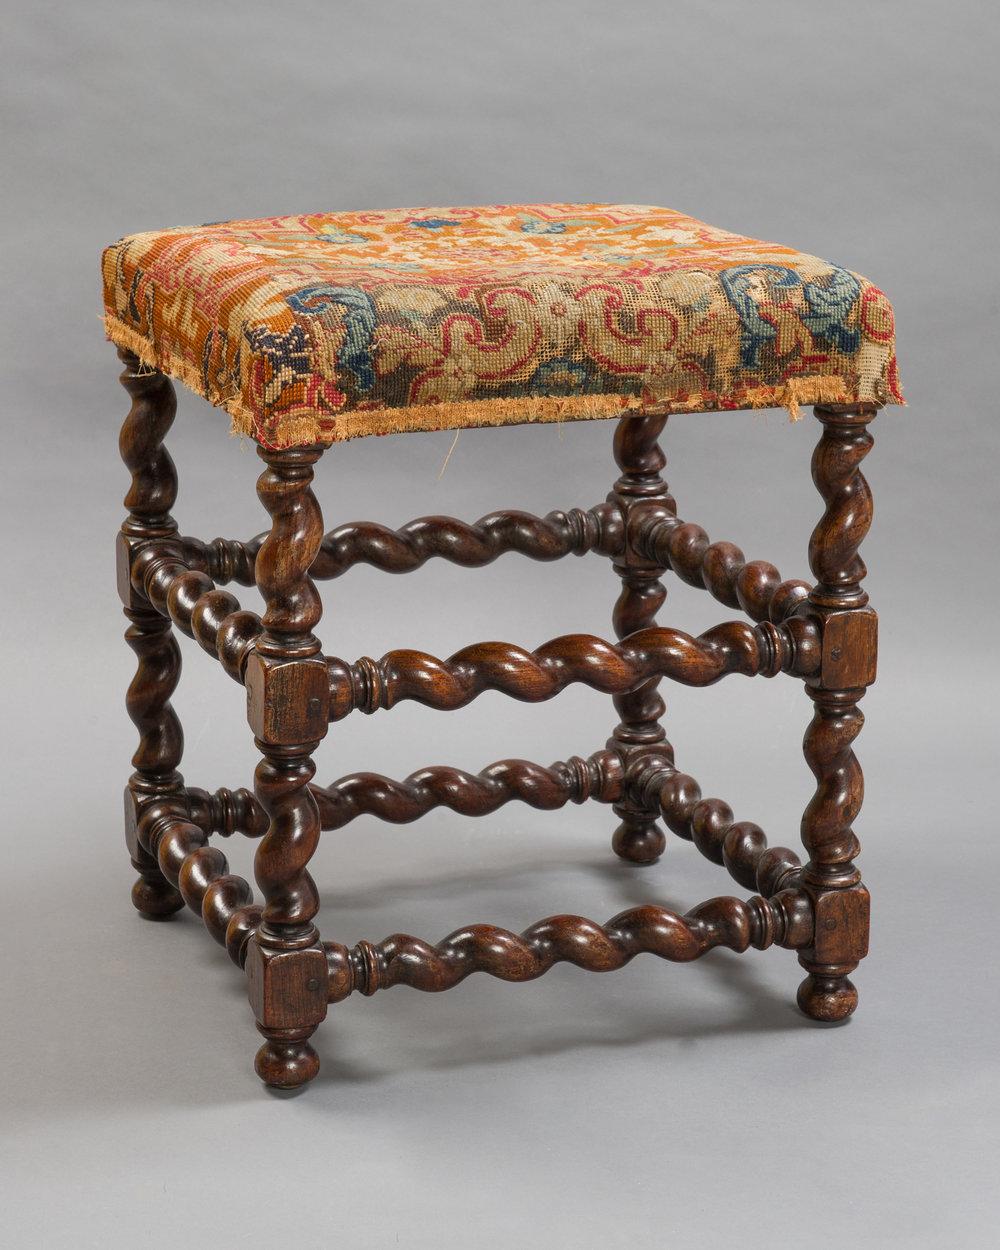 Upholstered foot stool, (Gistoffeerde voeten brankje) walnut, barley, or sugar twist frame, 1670-1685, Netherlands. Photo by On Location Studios, Poughkeepsie, NY, 2017. Courtesy Historic Huguenot Street.